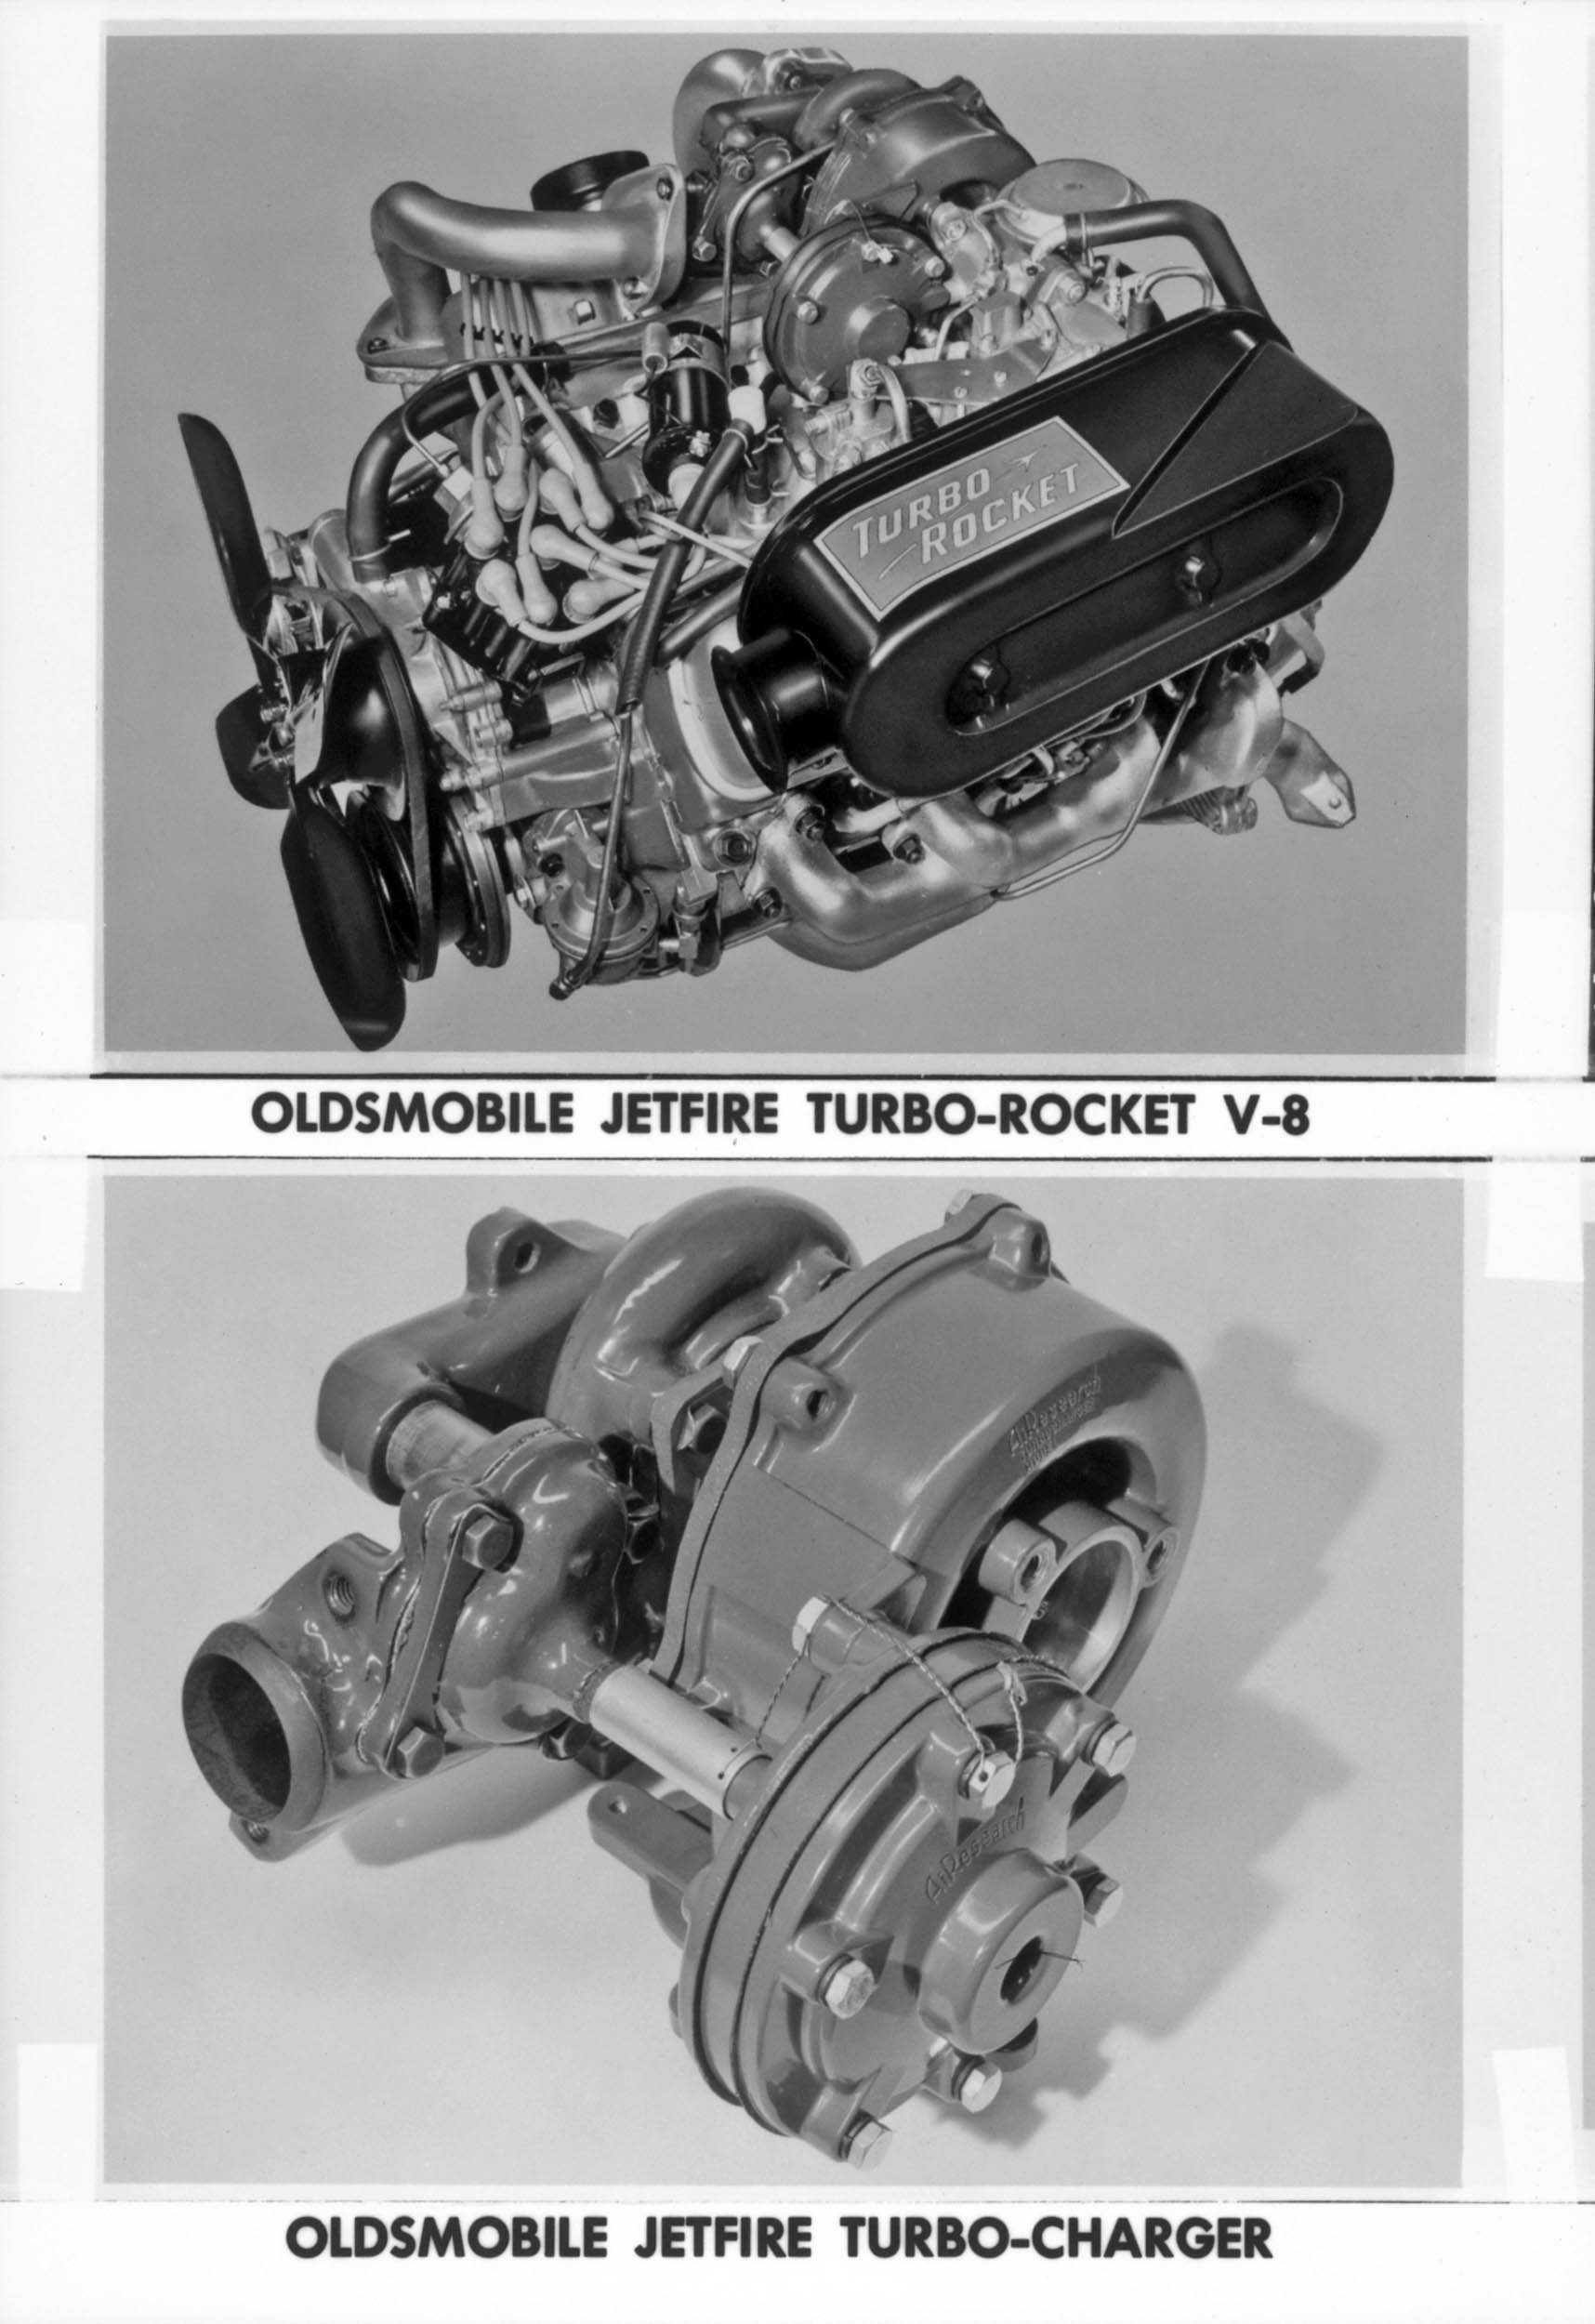 1963 Oldsmobile Jetfire Rocket V-8 and its factory turbocharger